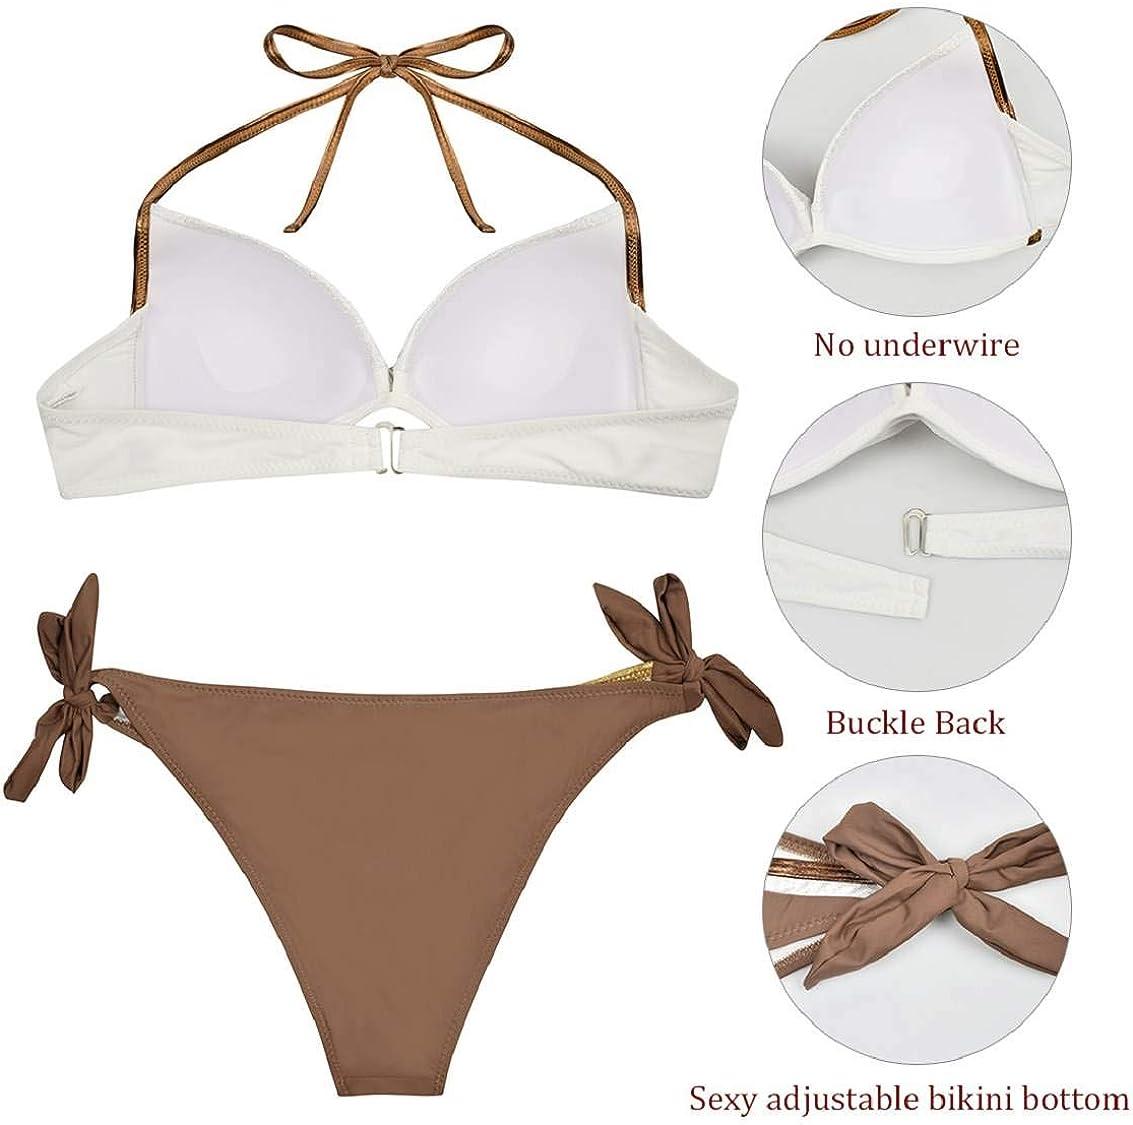 heekpek Femme Maillots de Bain 2 Pi/èces Bikinis Dos Nu Taille Bas Push-up Rembourr/é Bikini Bandage Bikini Ensemble Rembourr/é Bikinis Triangle